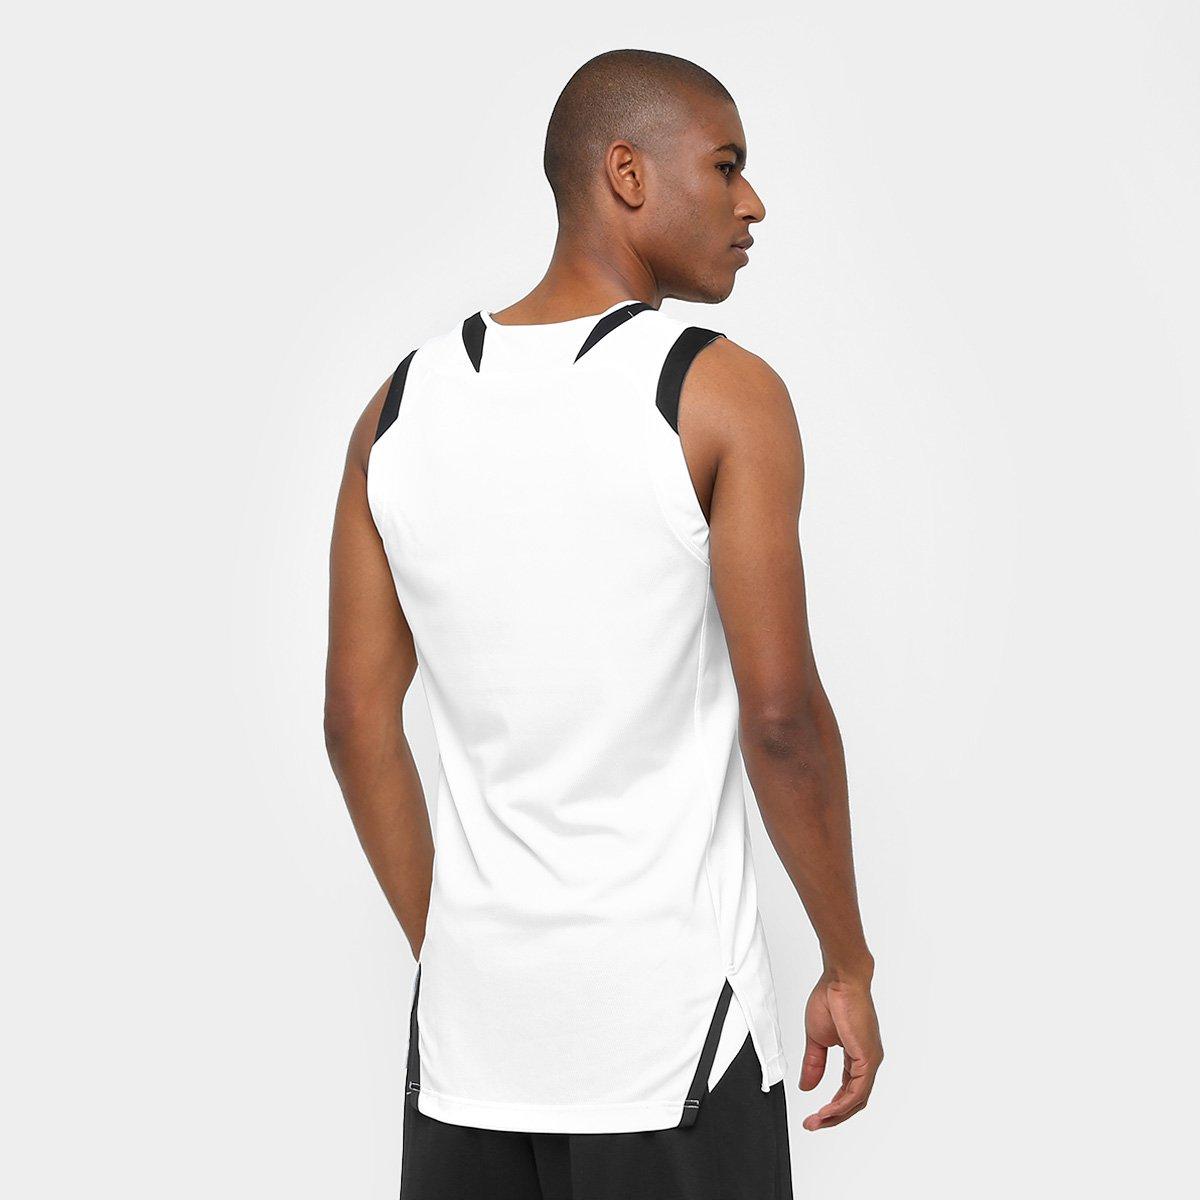 Camiseta Regata Adidas Teamstock Masculina  Camiseta Regata Adidas  Teamstock Masculina ... 26116da2789